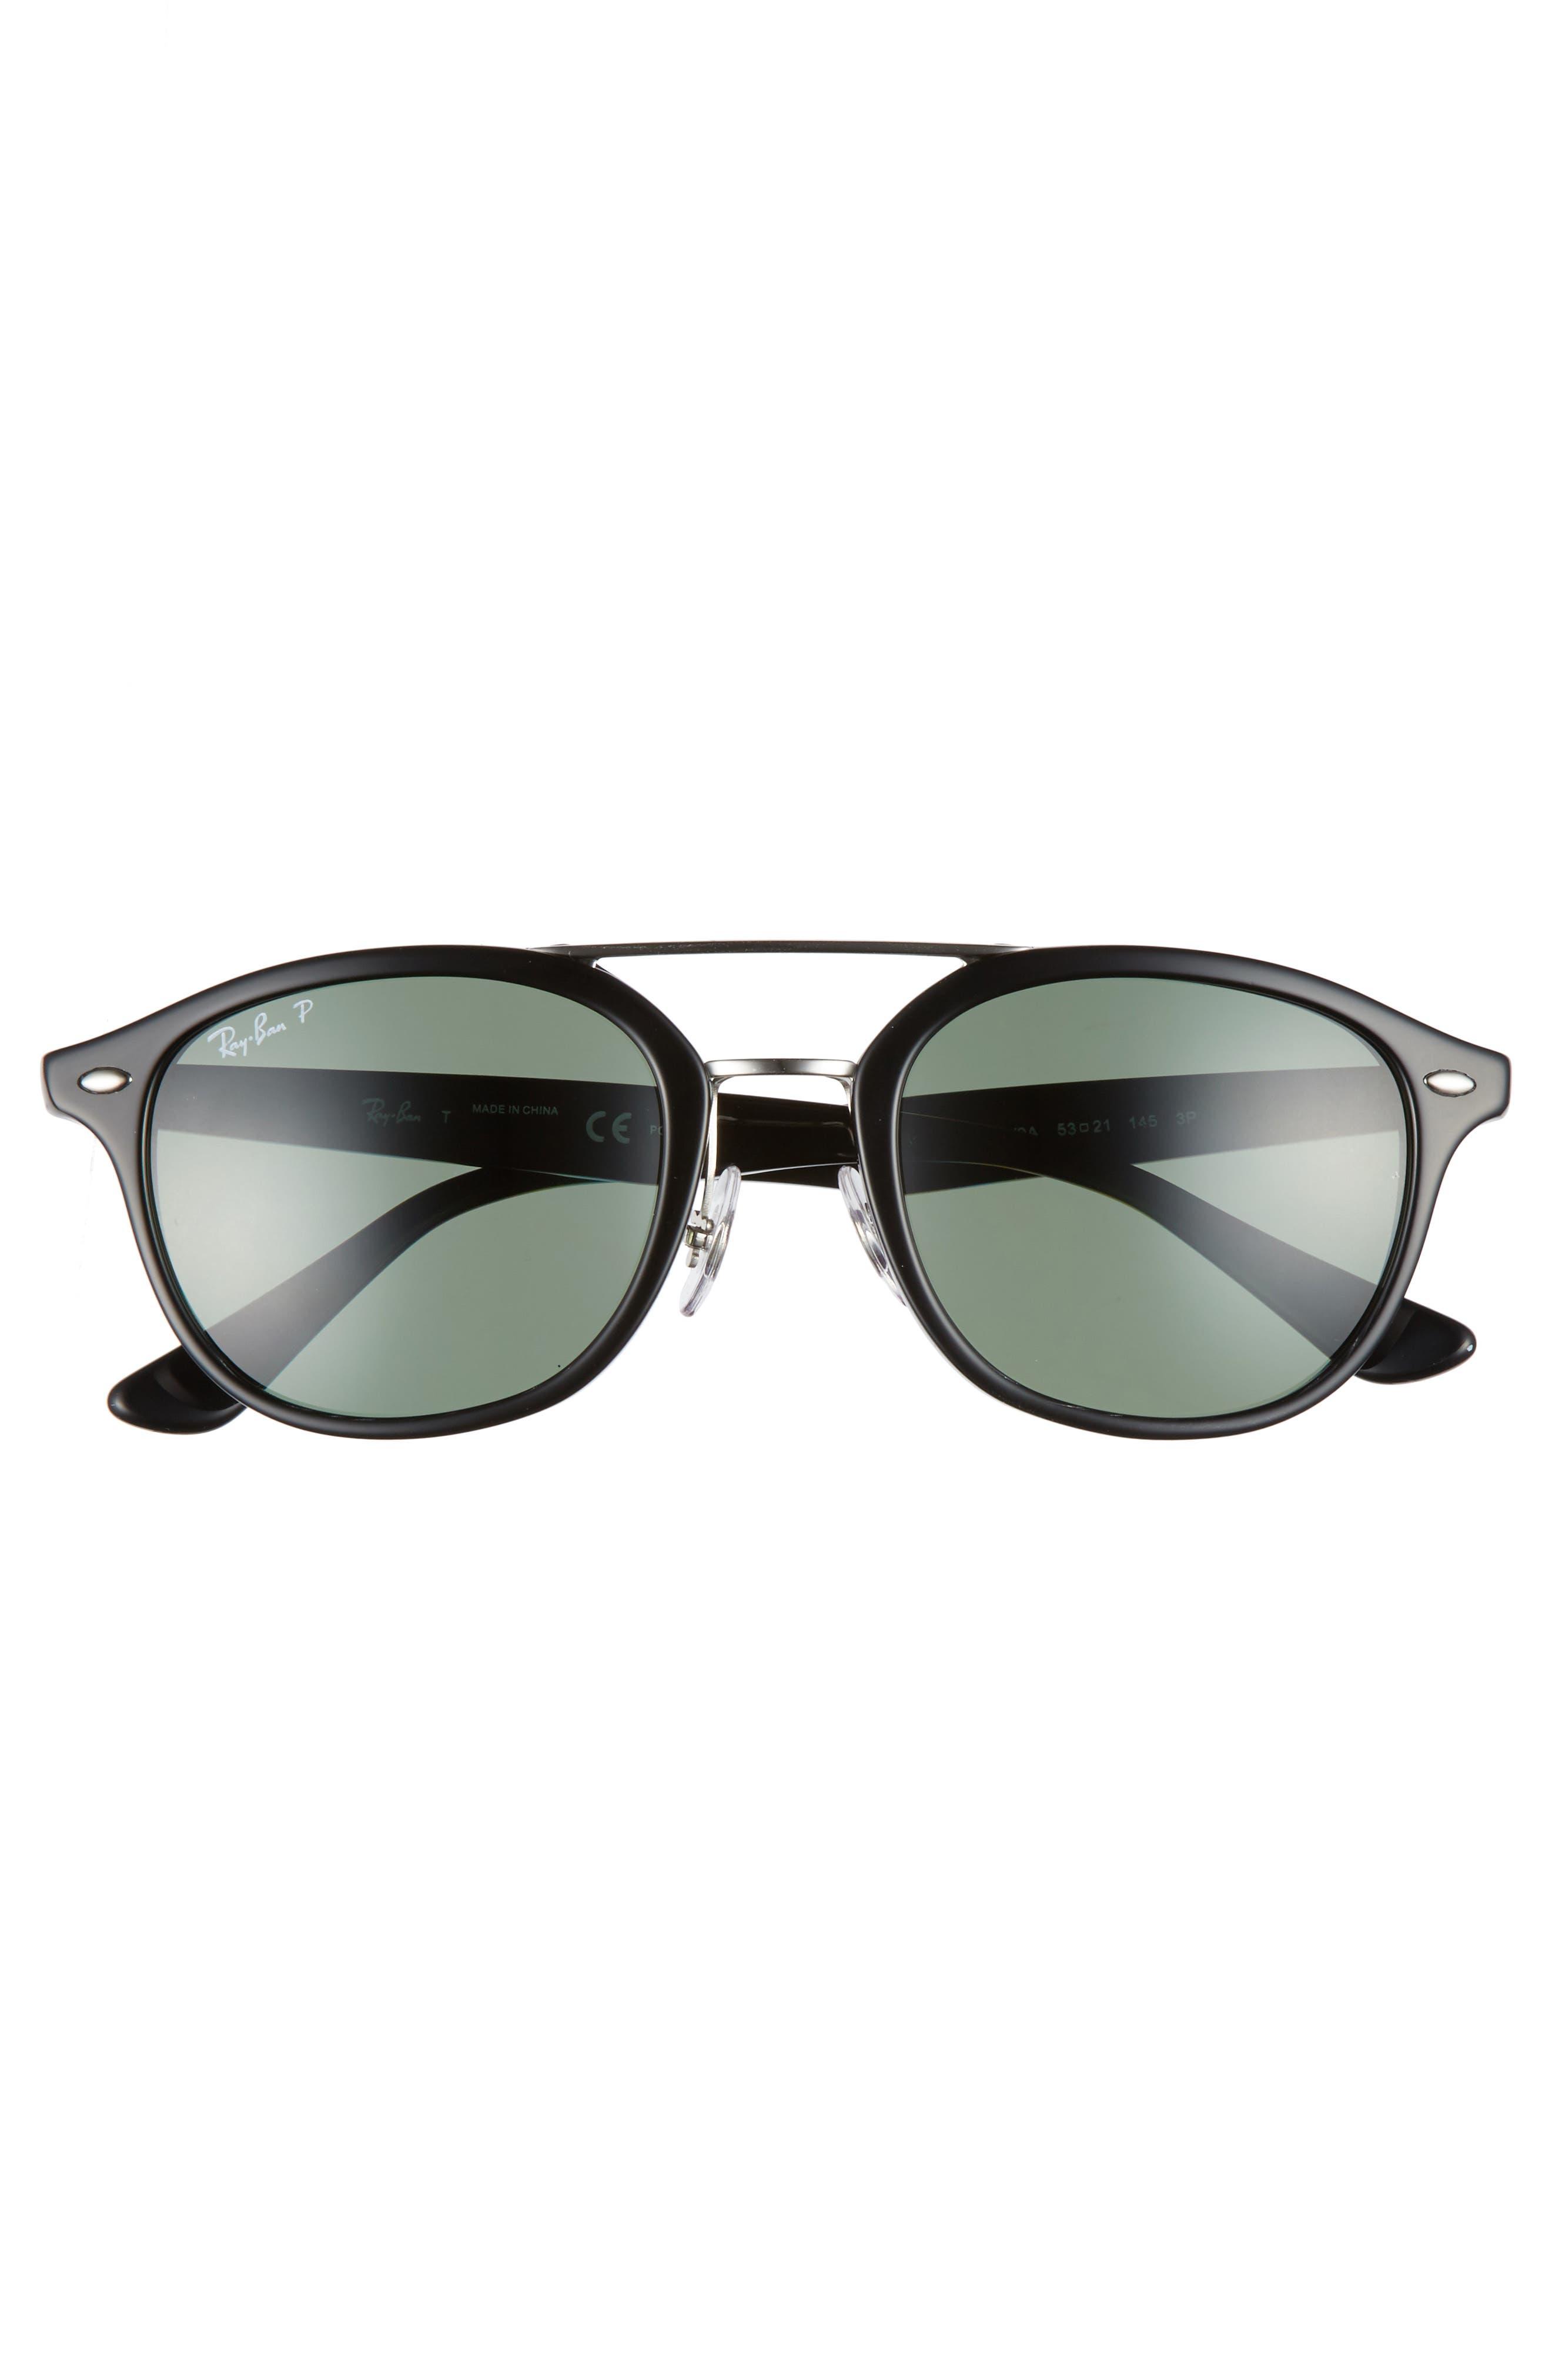 53mm Polarized Sunglasses,                             Alternate thumbnail 2, color,